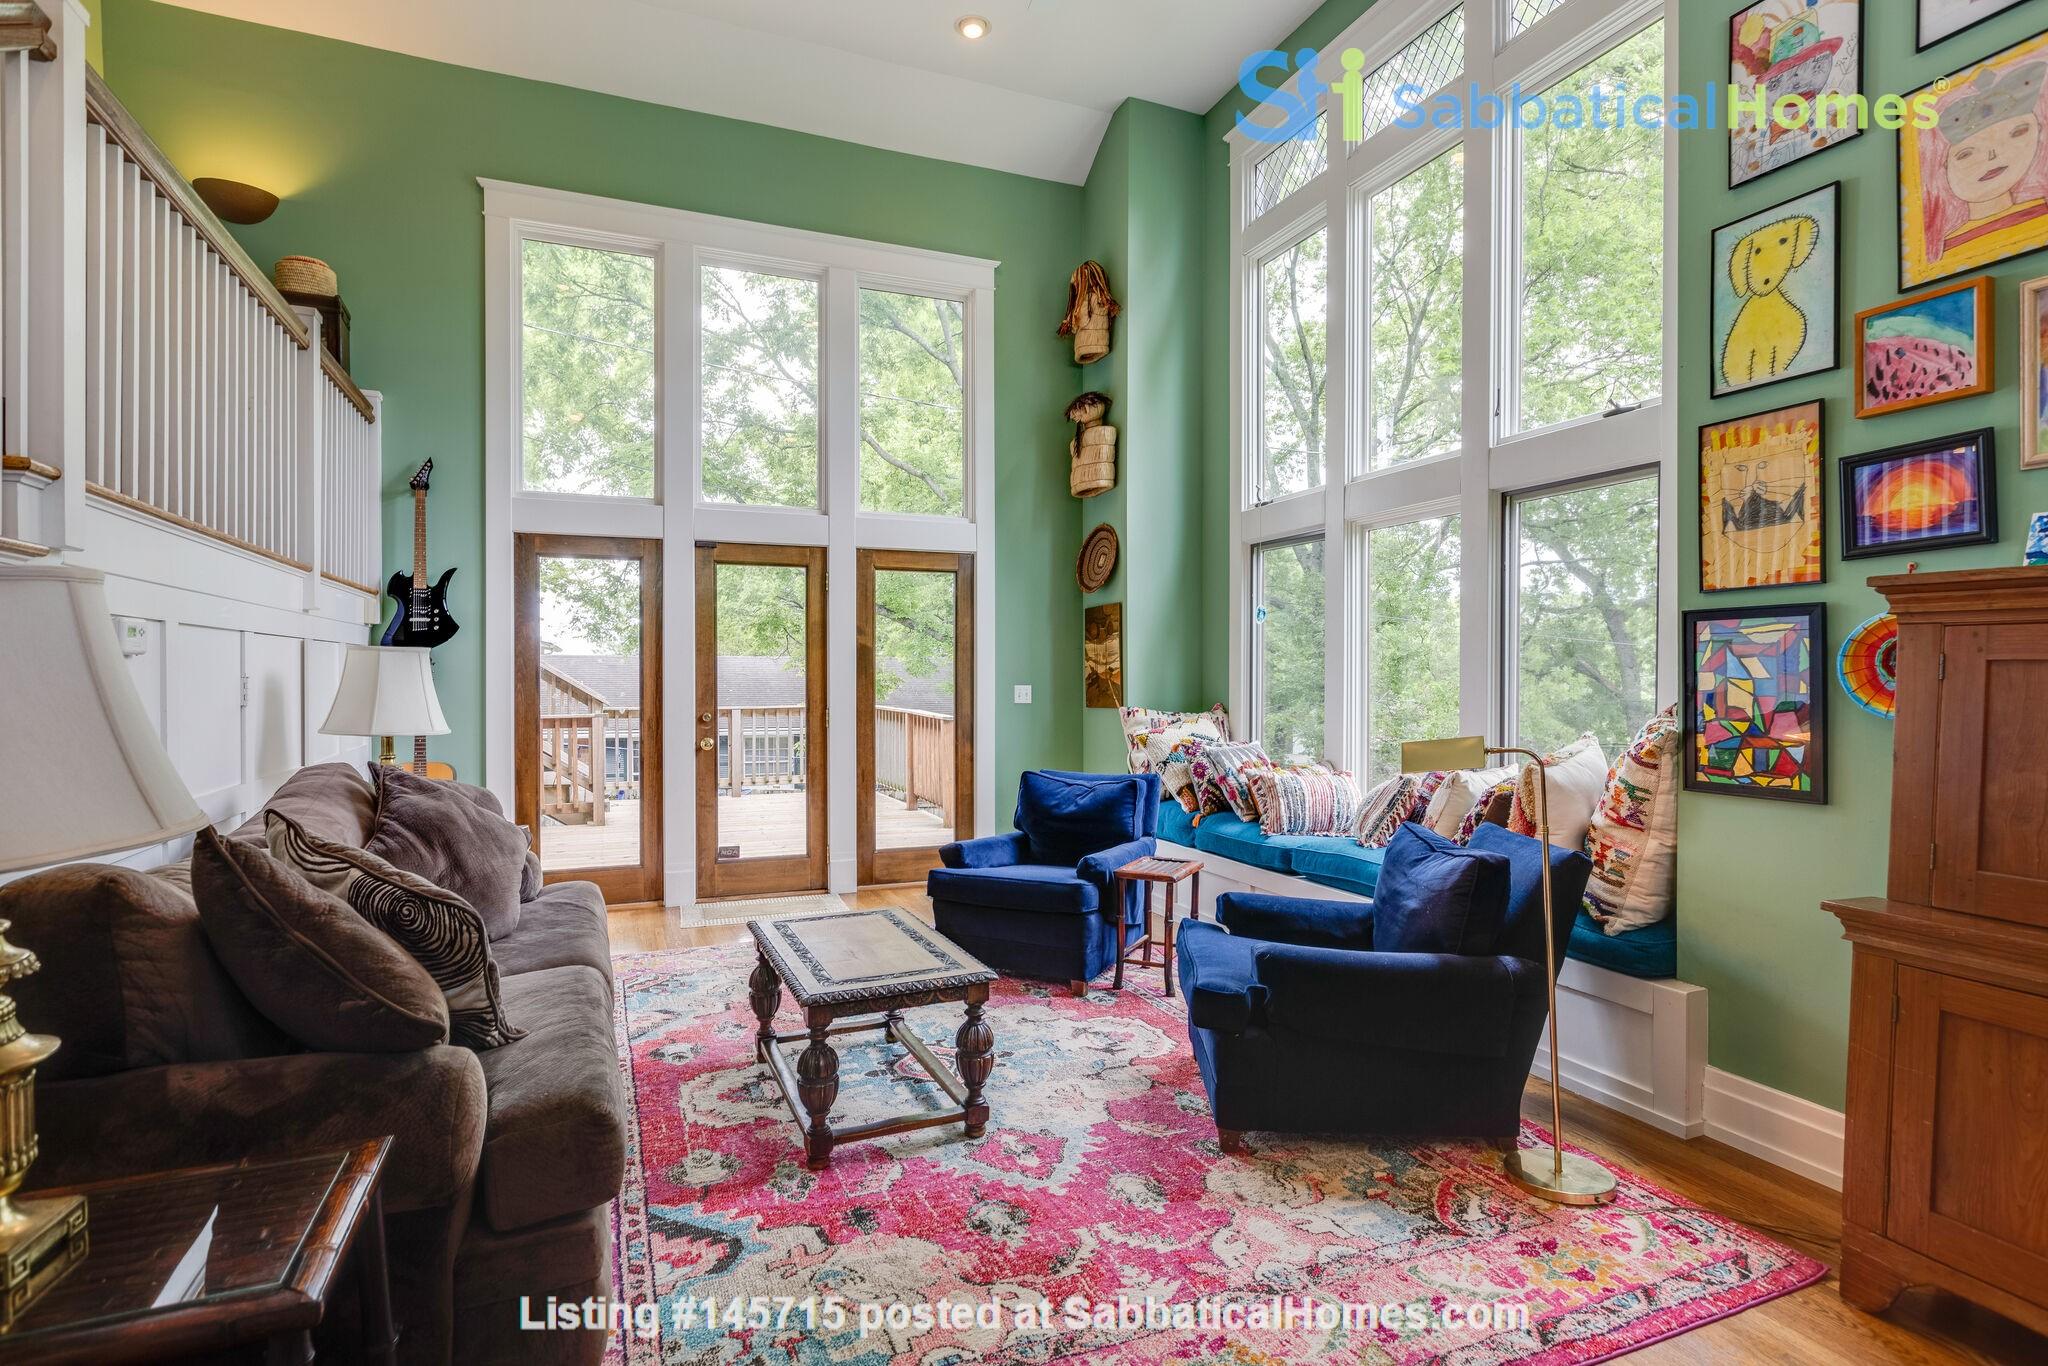 5 BR/3 + 2 BA Historic gem in Belmont-Hillsboro Home Rental in Nashville 6